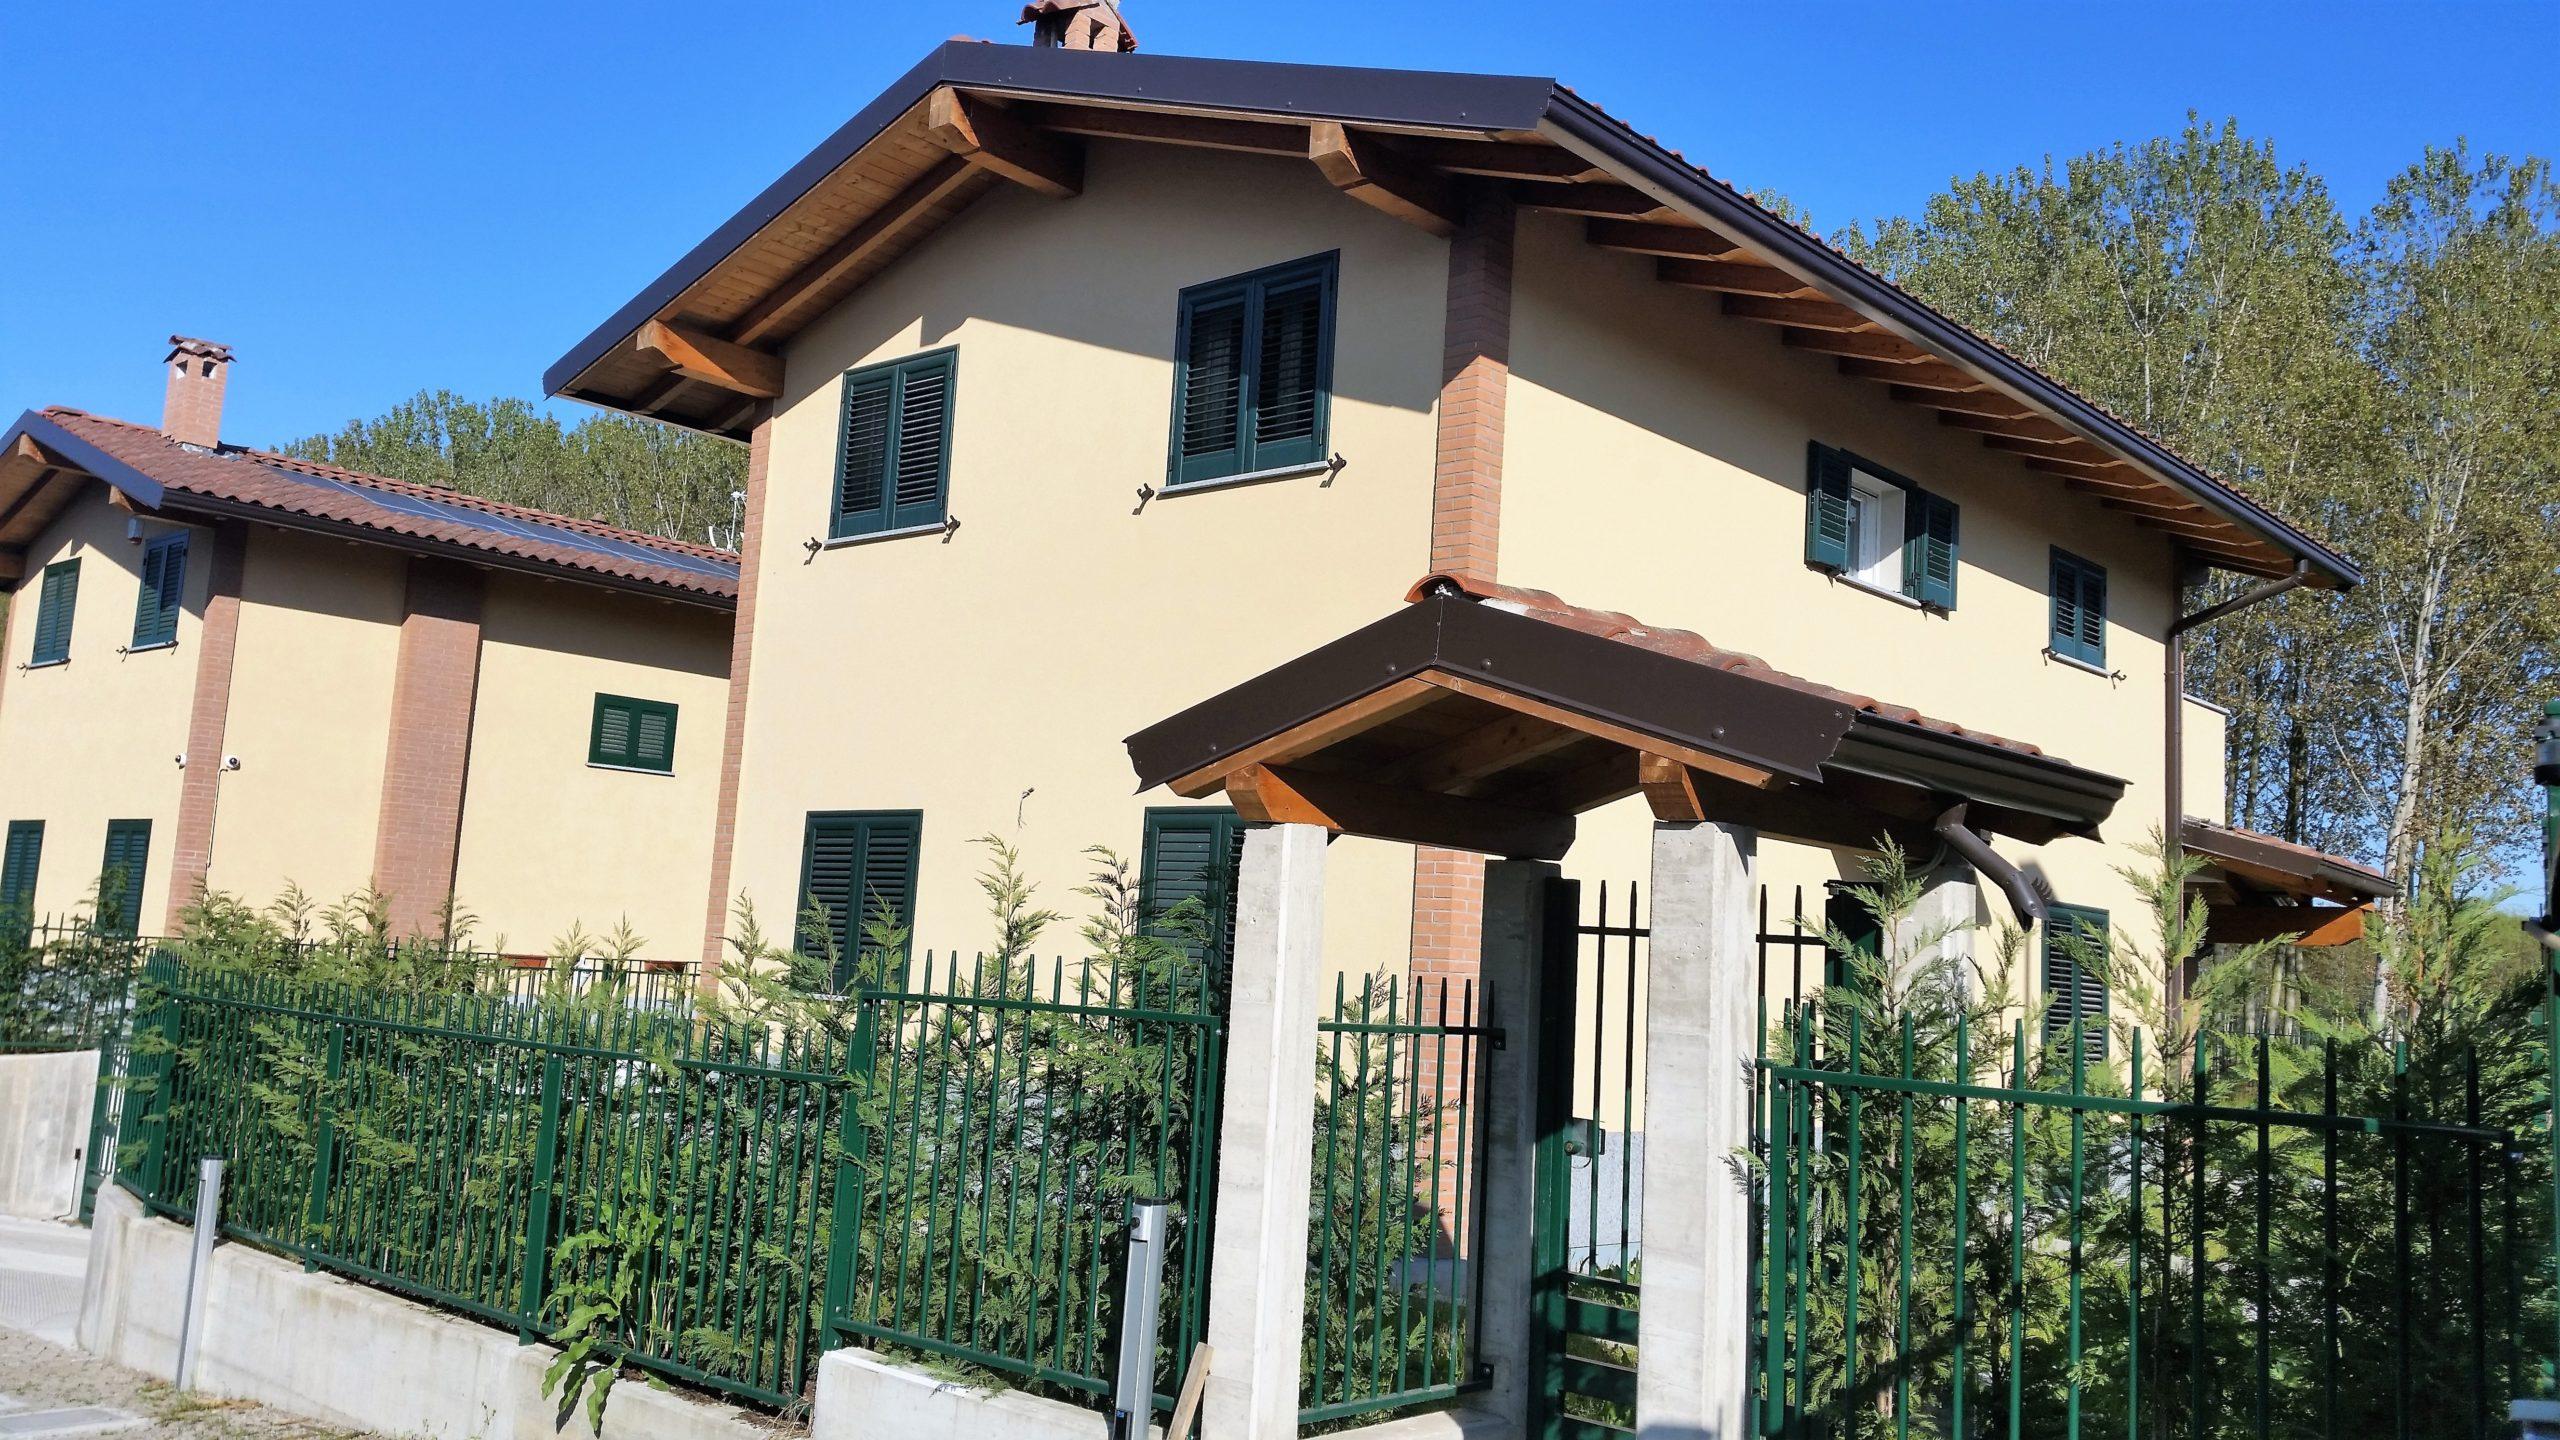 Motta Visconti (MI) Villa singola